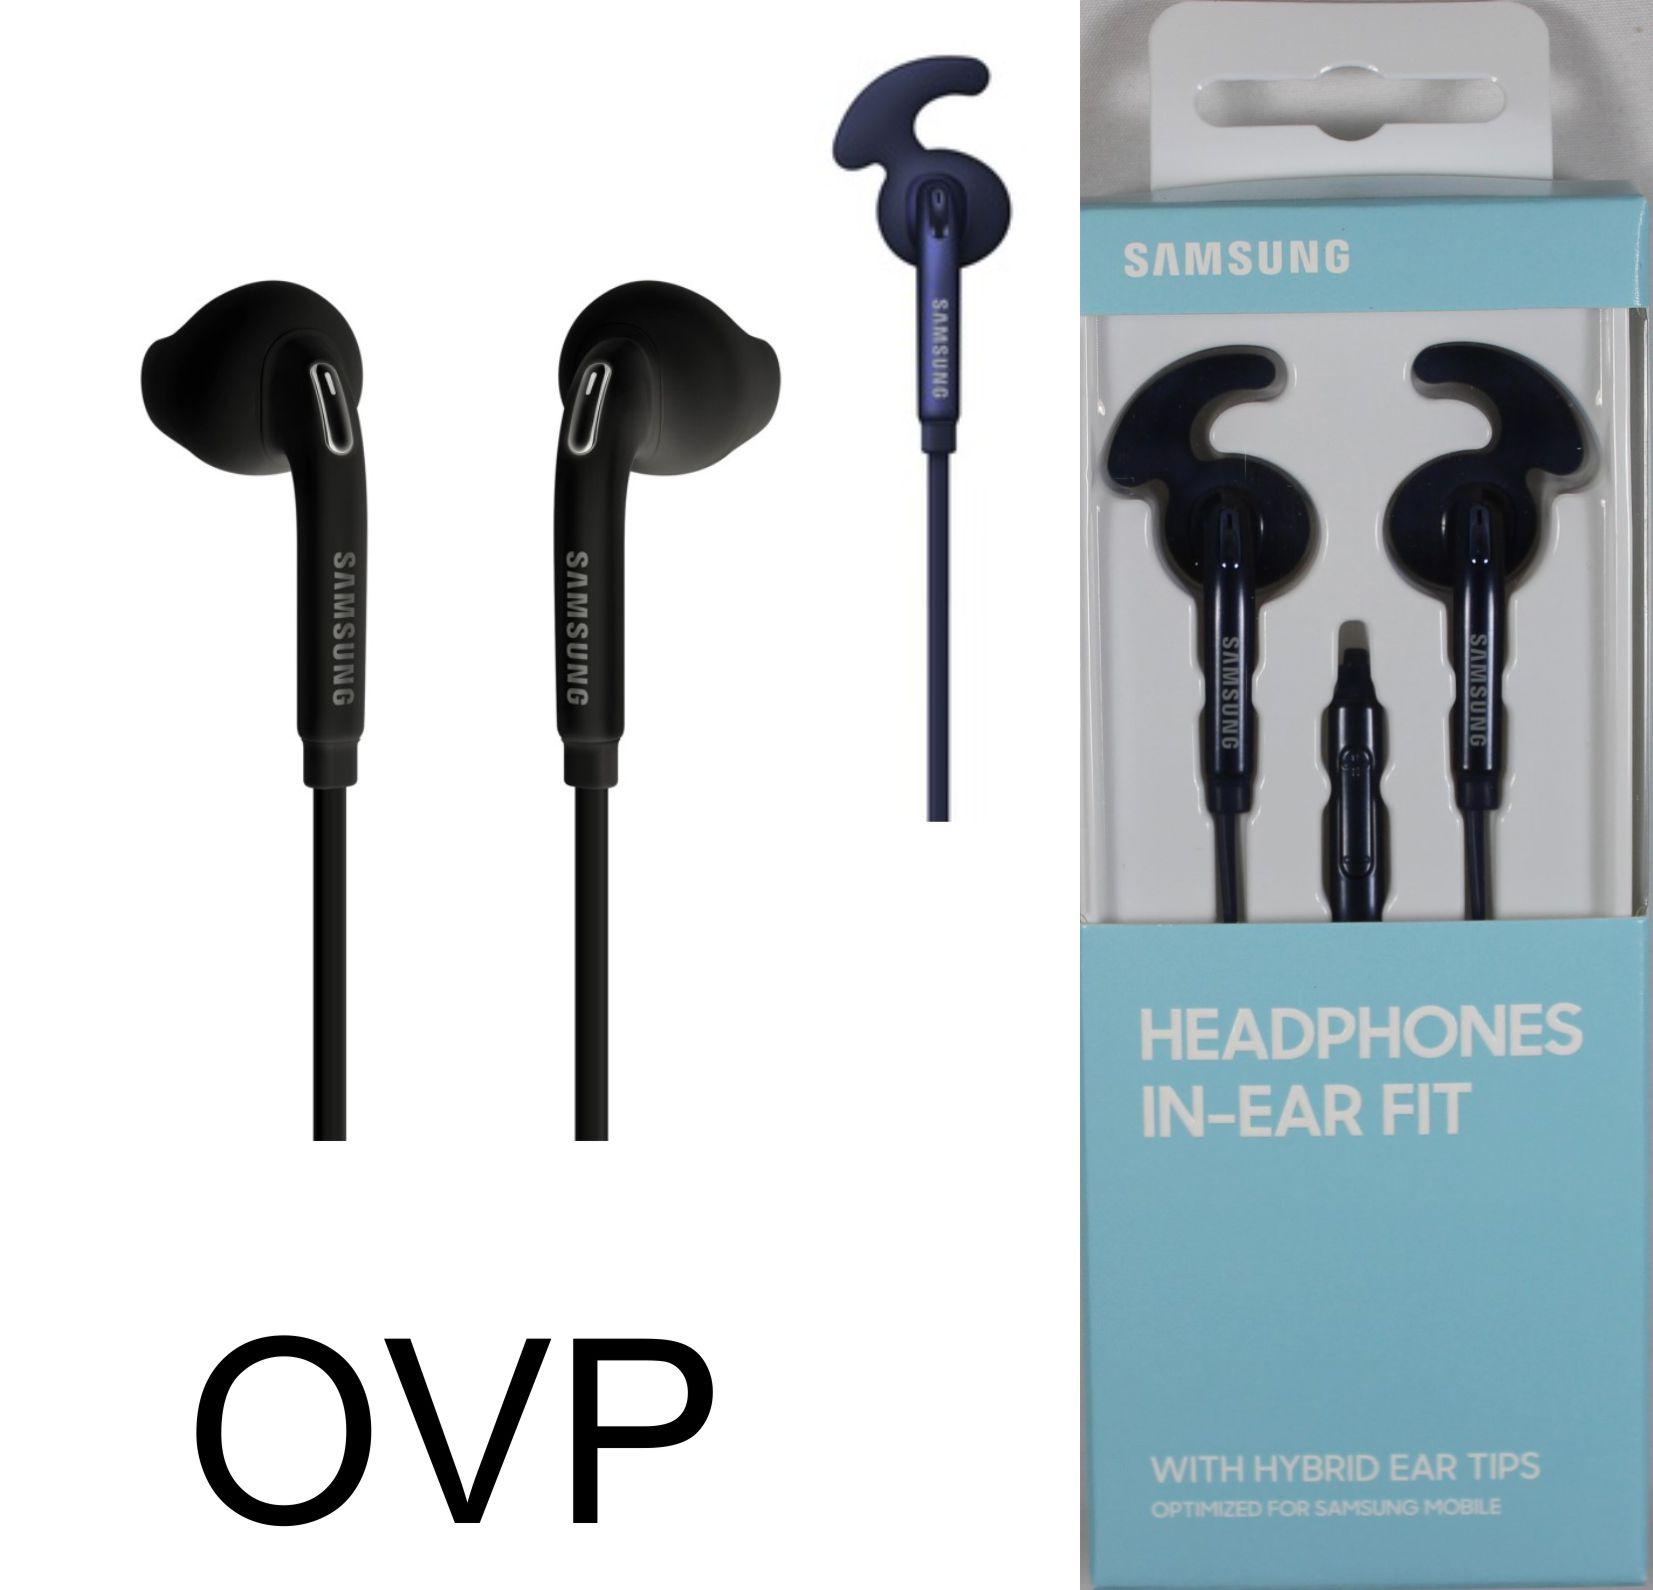 Earphones in ear headphones - samsung headphones in ear fit